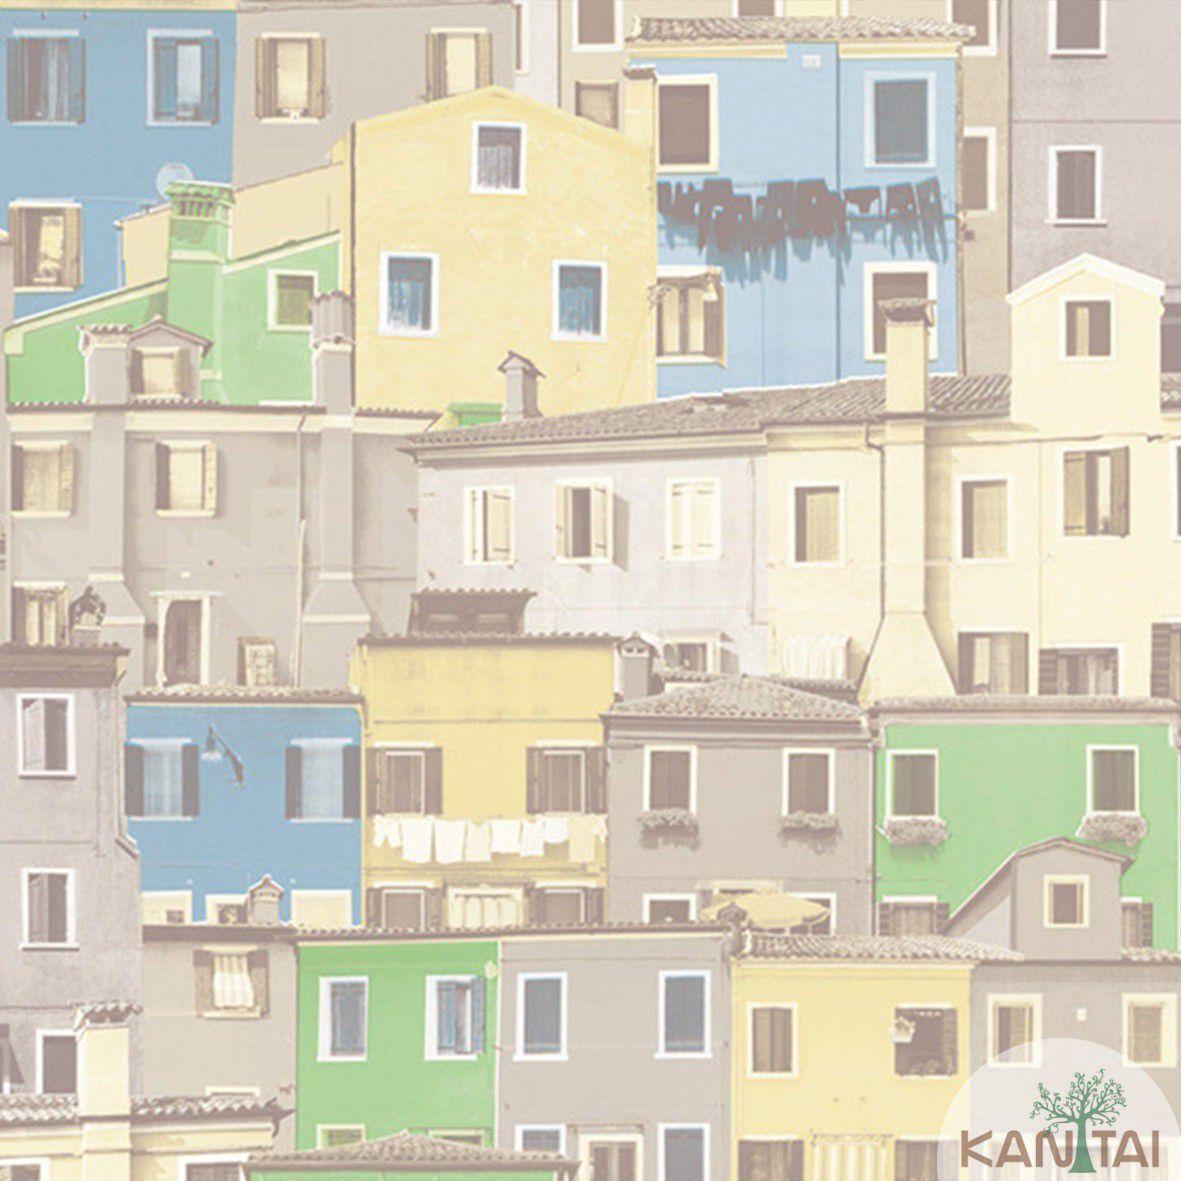 Papel de Parede  Vinilico Kan Tai Coleção Neonature III 3D Casas Cinza, Verde, Azul, Amarelo